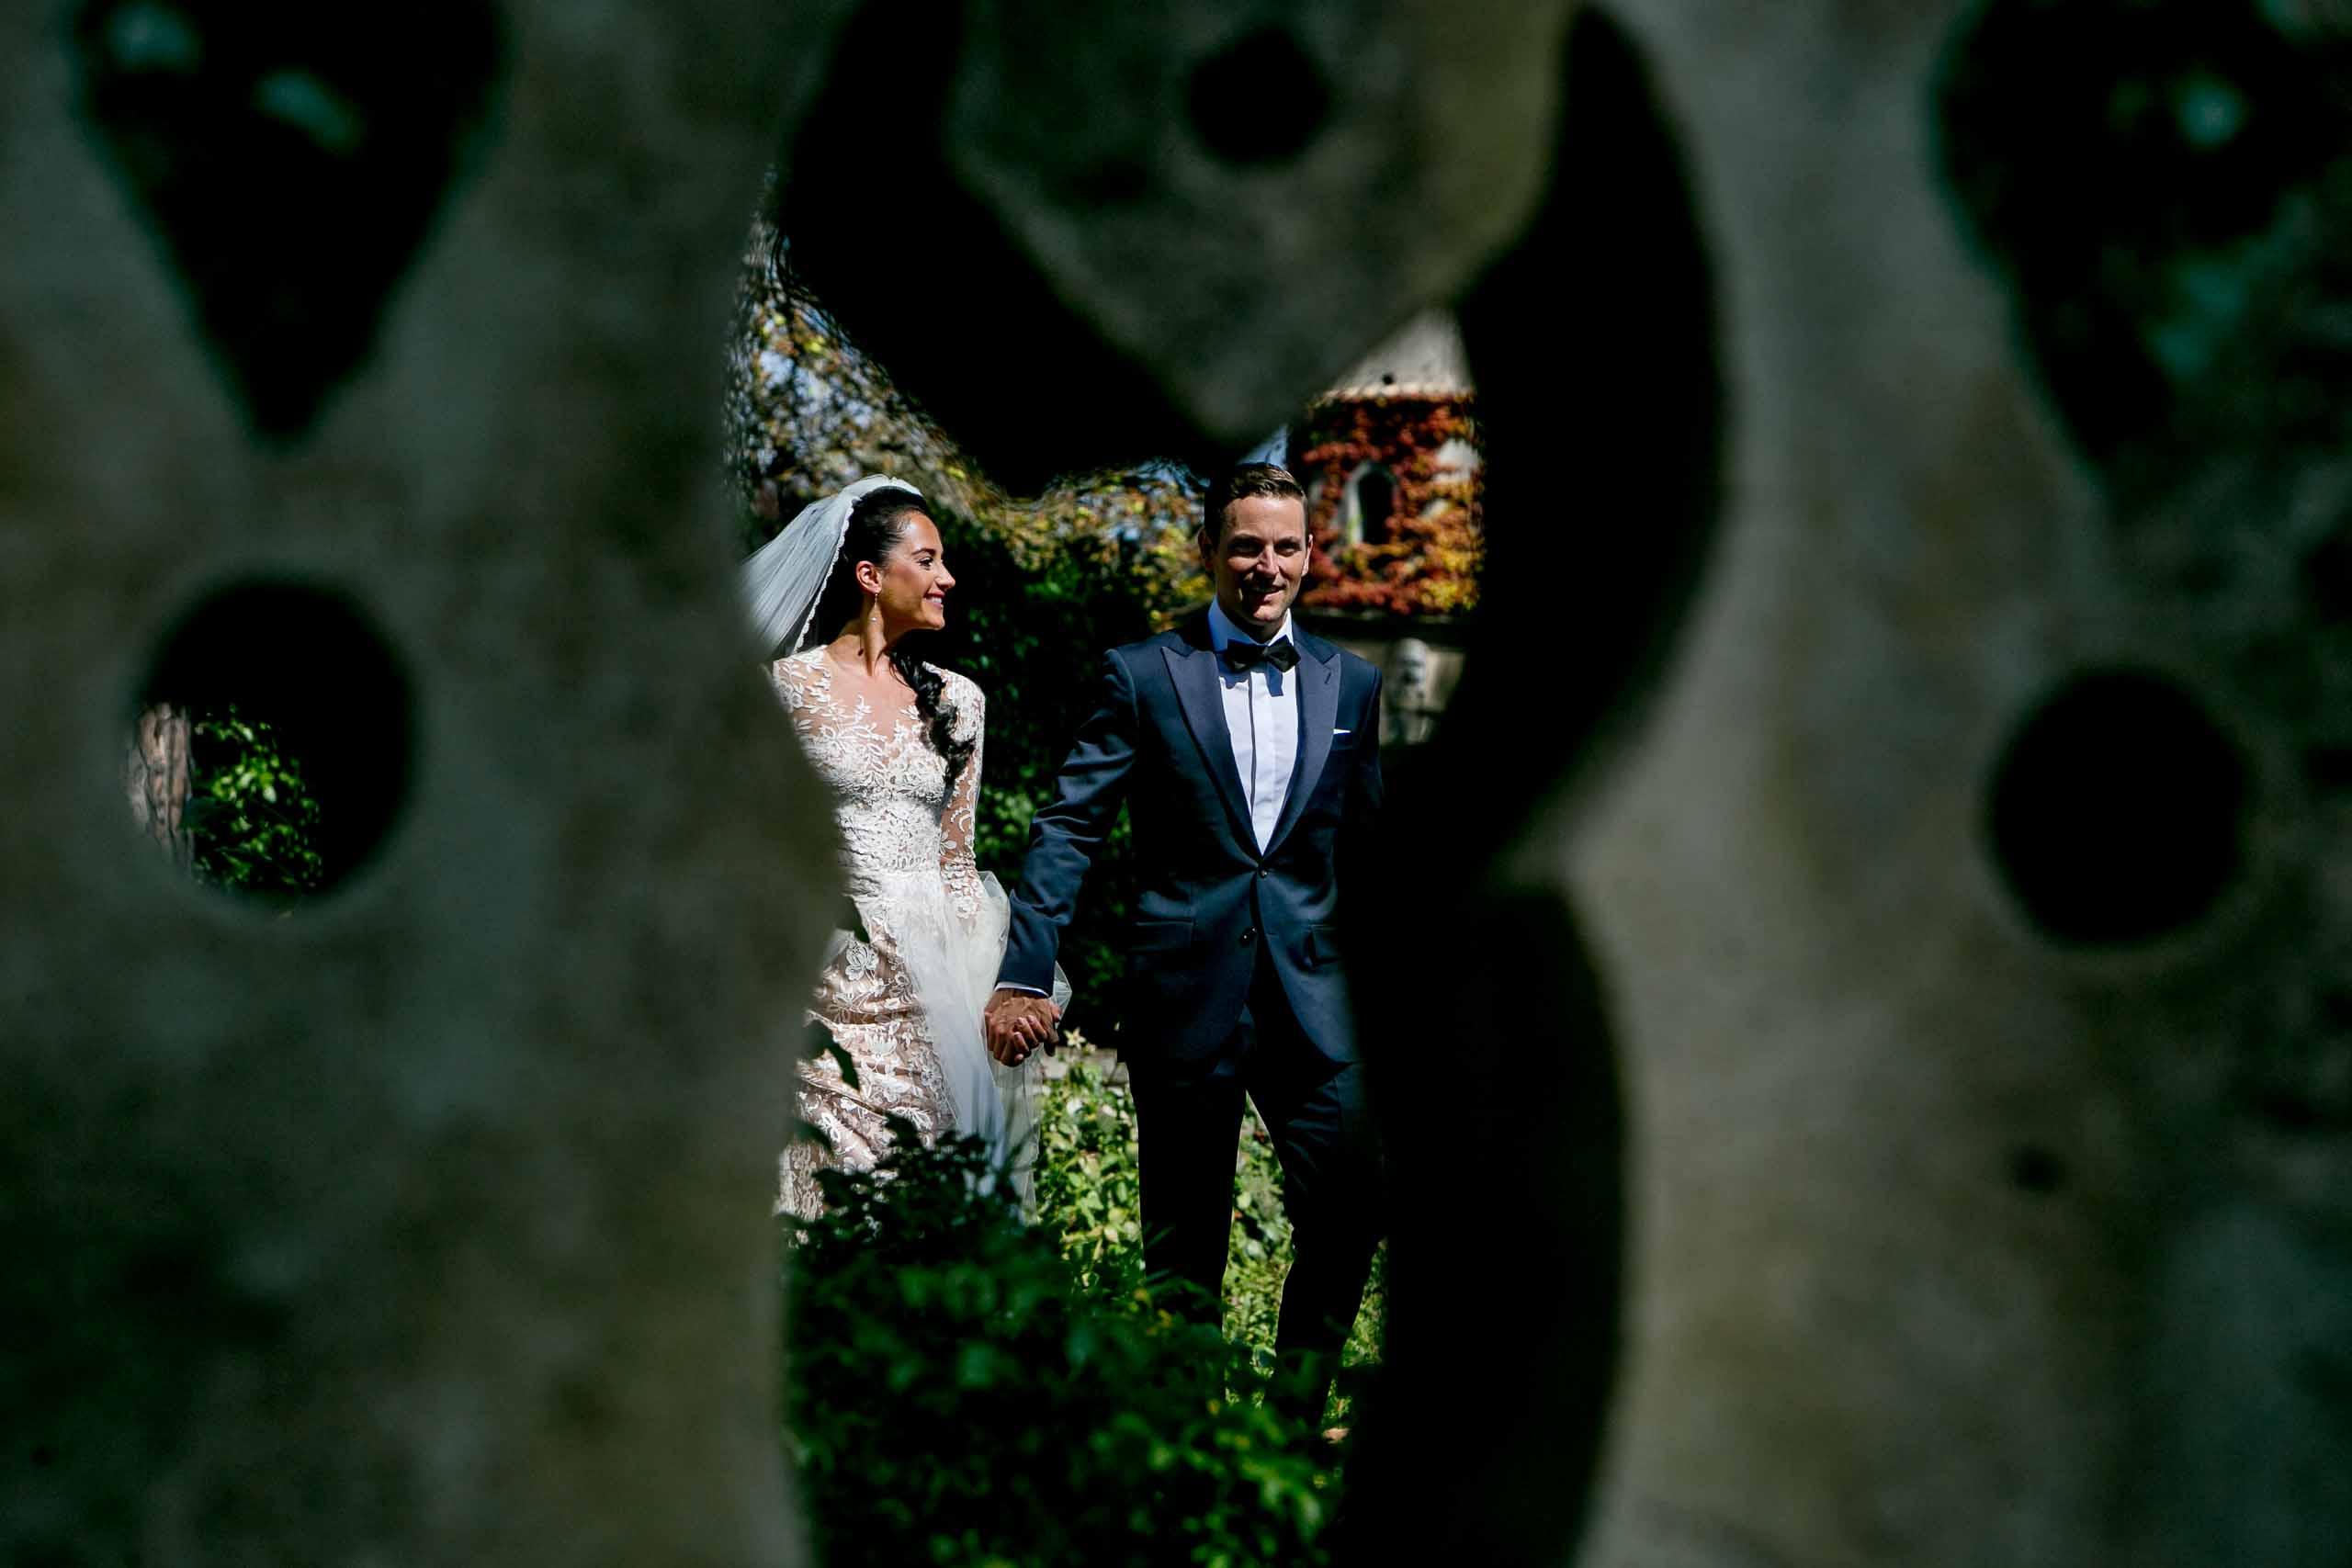 Bride and groom walking through Villa Cimbrone garden during their Ravello elopement in Amalfi, Italy